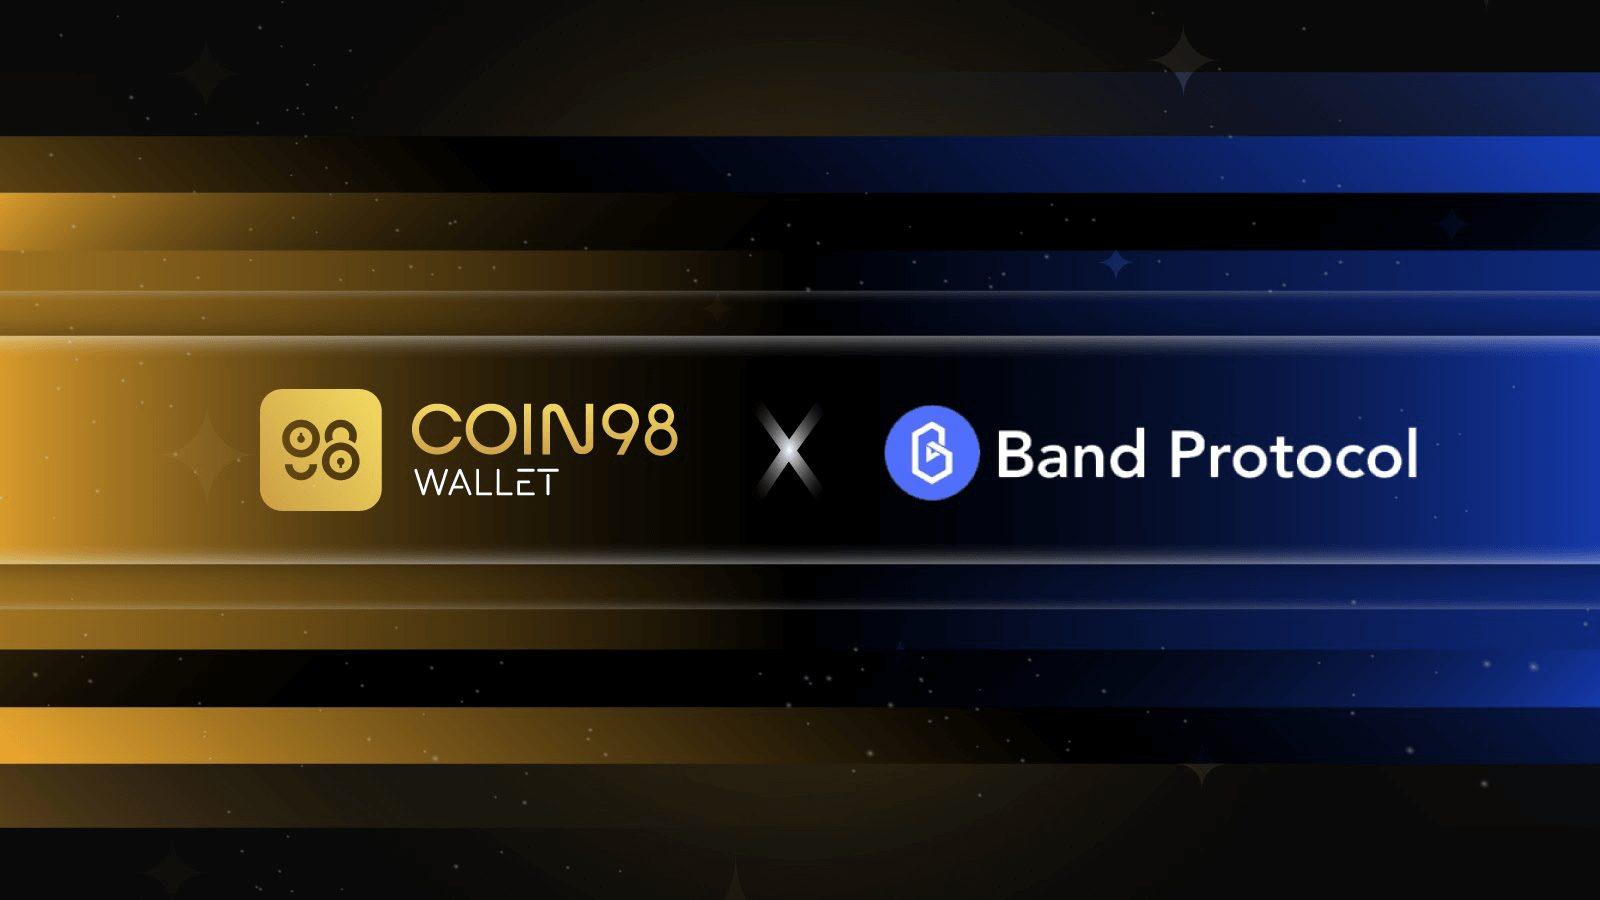 Coin98 Wallet x Band Protocol Partnership